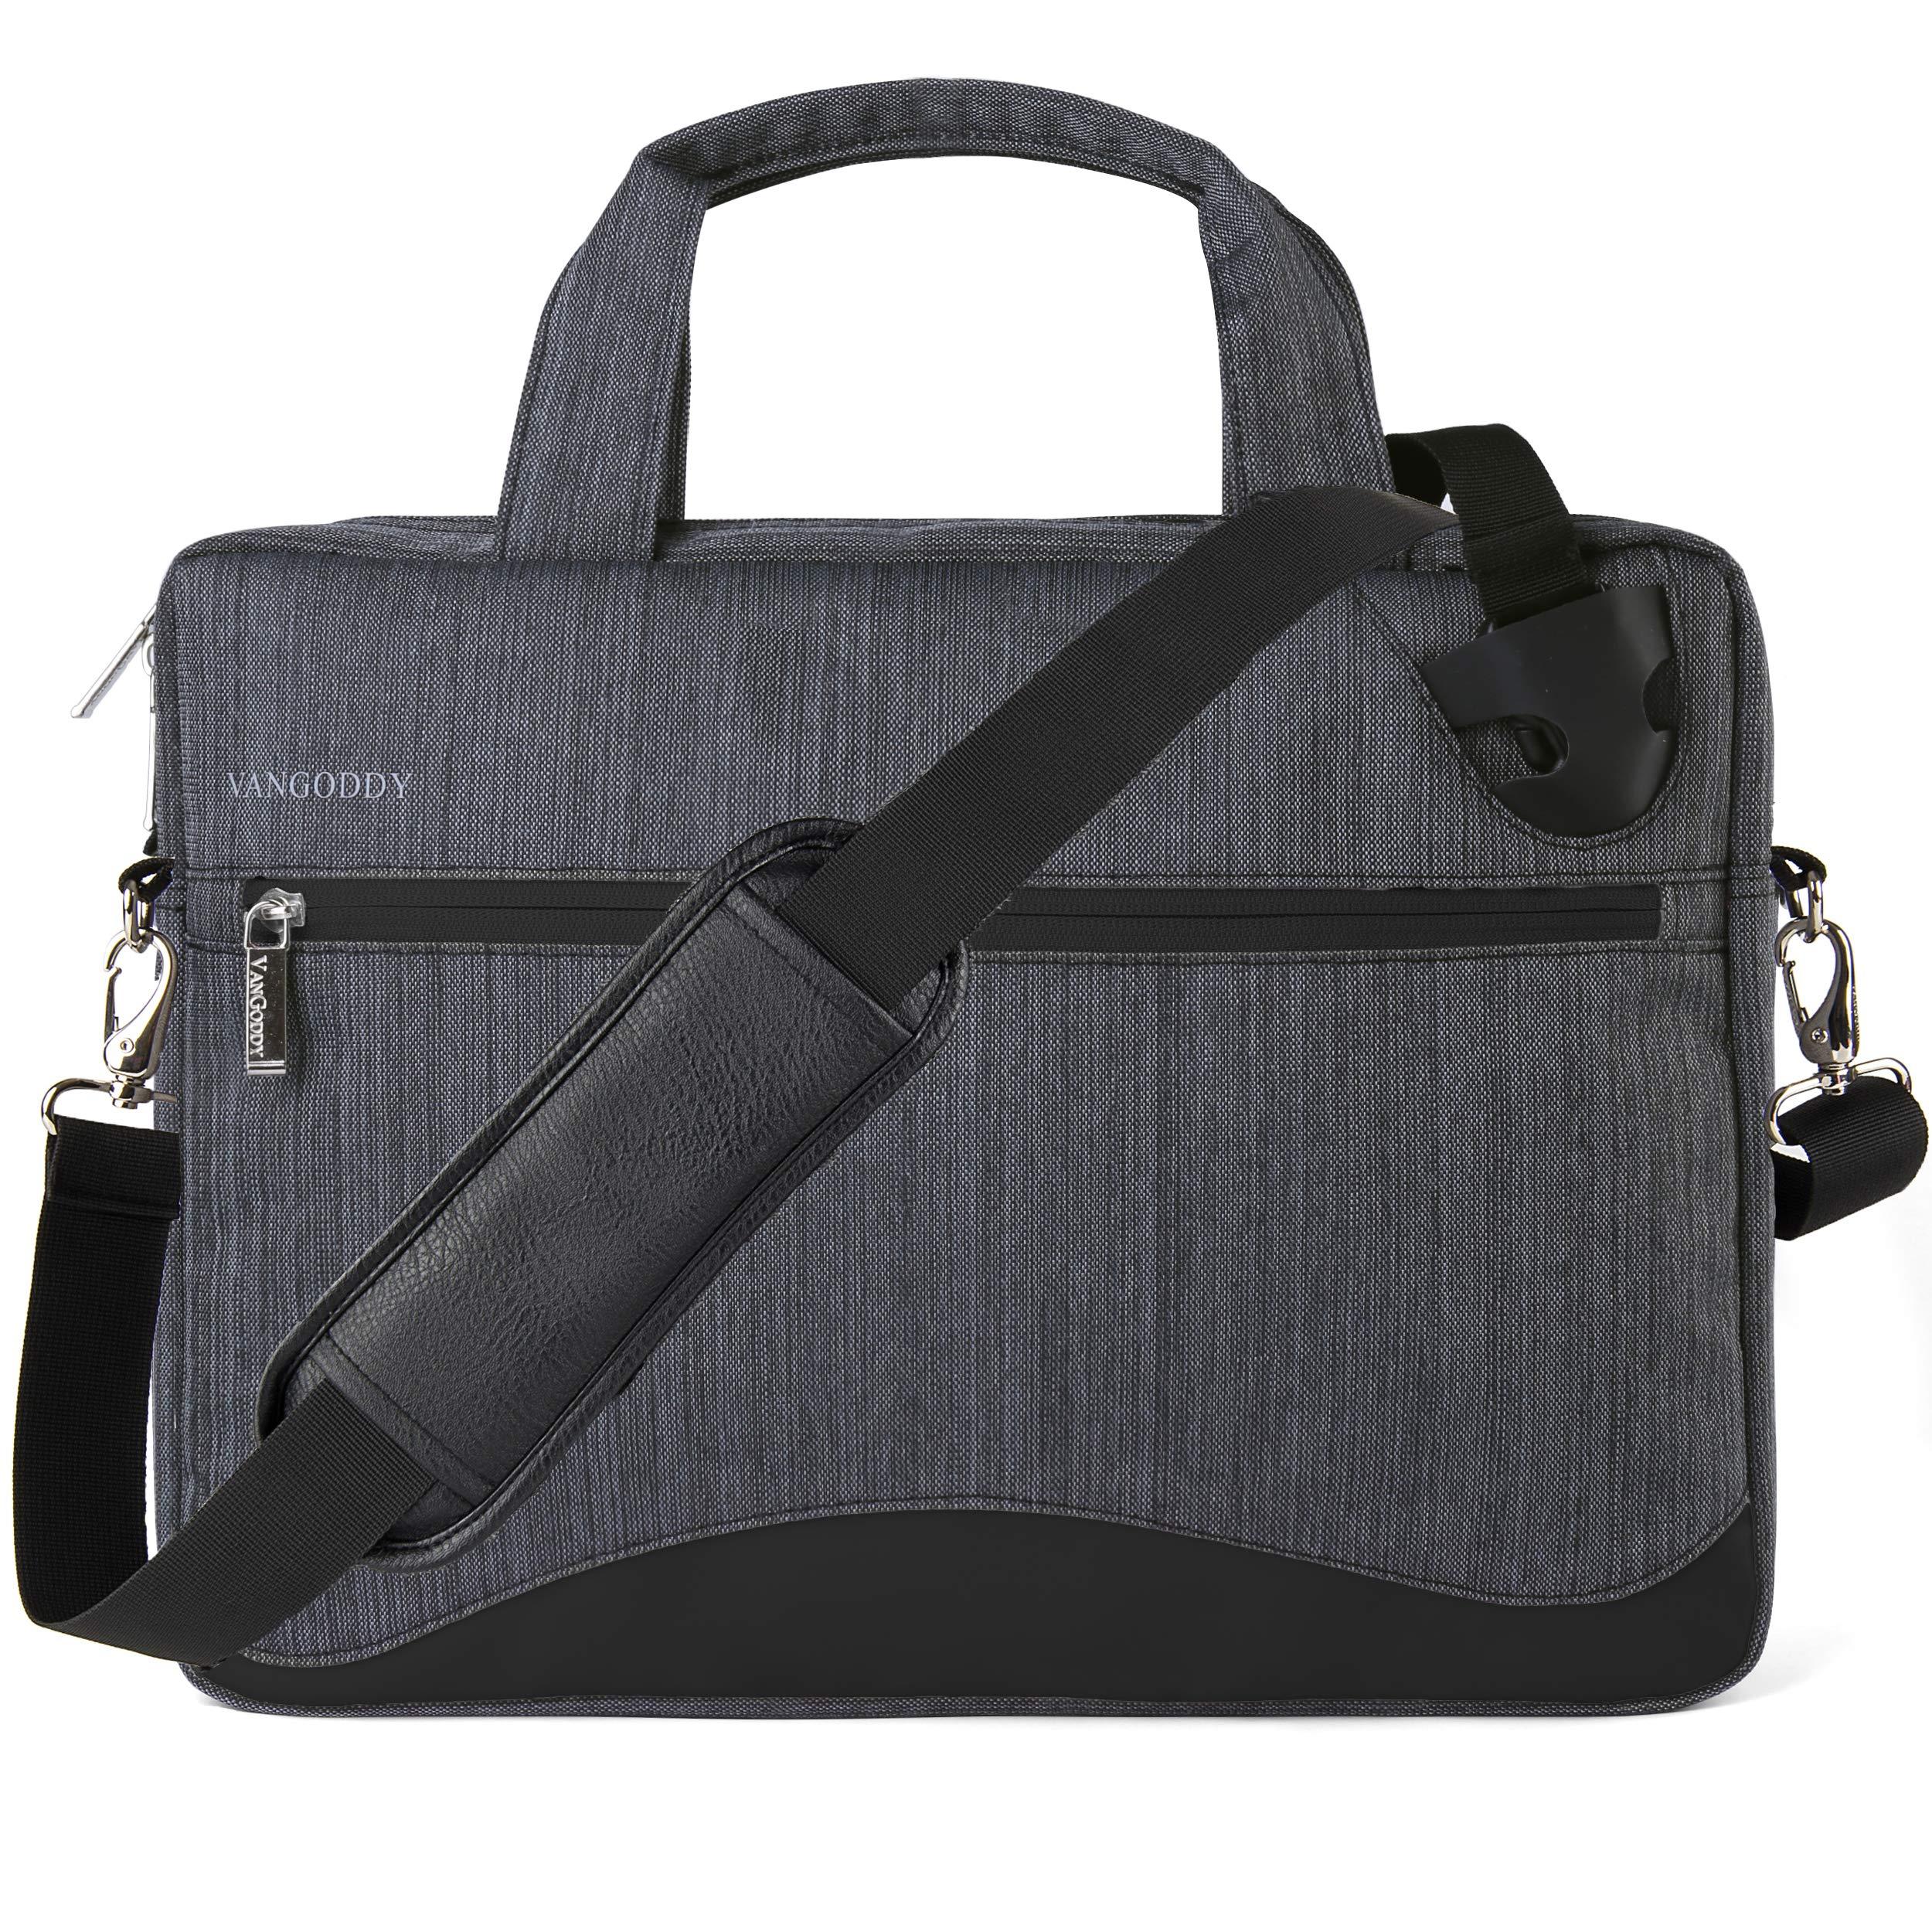 VanGoddy 17 17.3 inch Slim Gray Anti-Theft Laptop